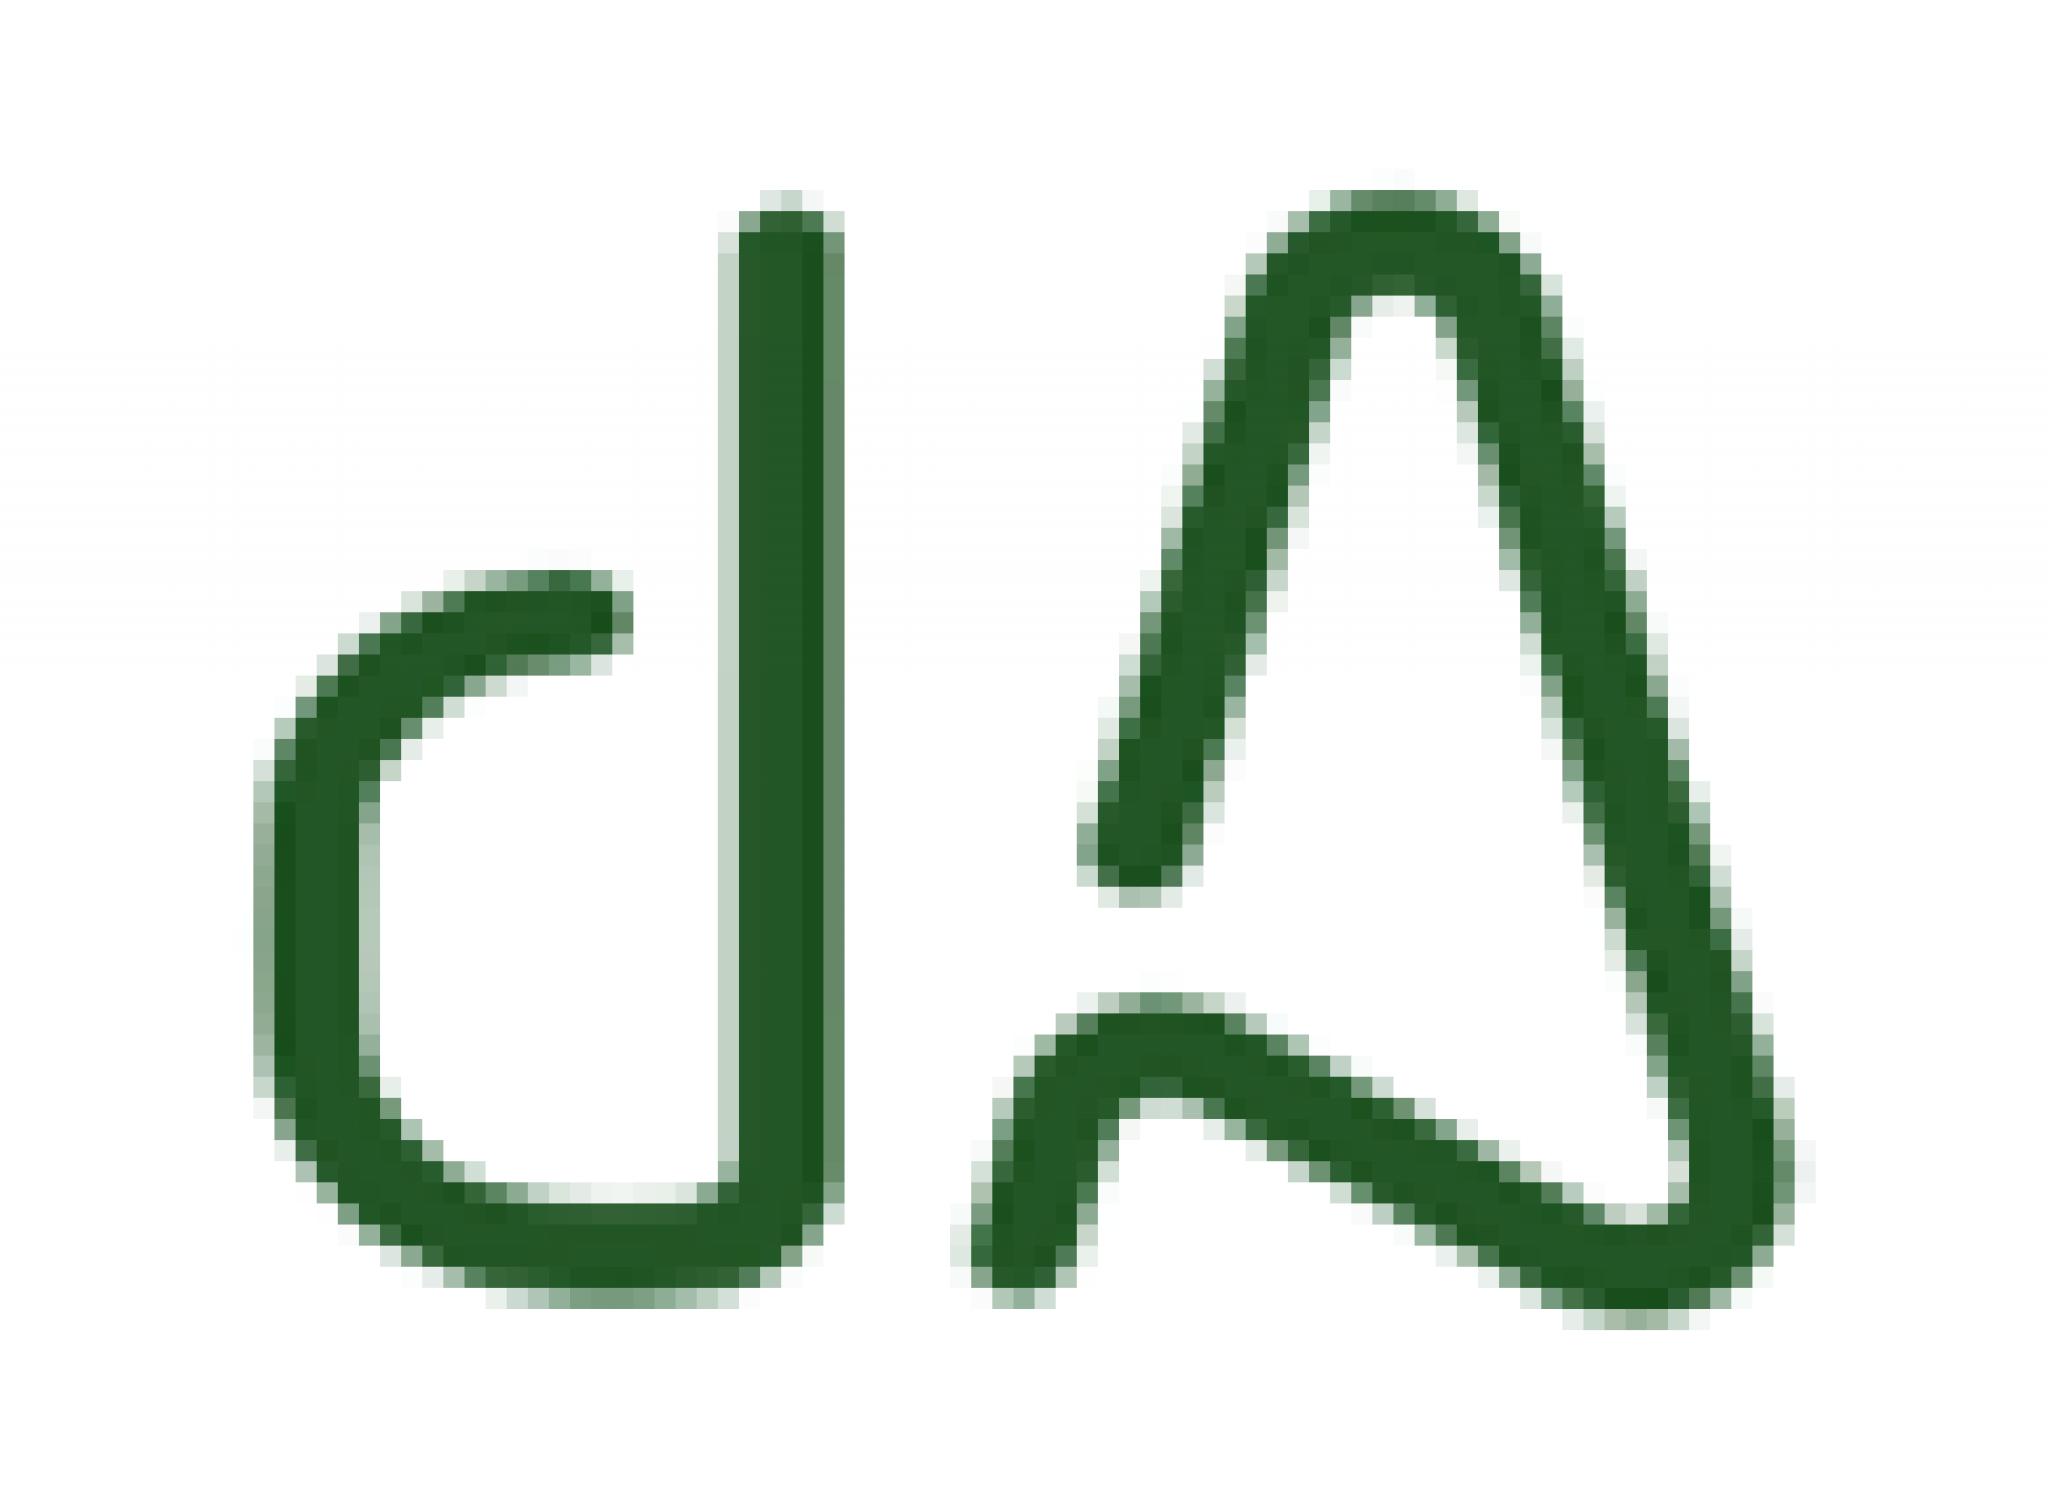 Praktik - Digital Mediabyrå